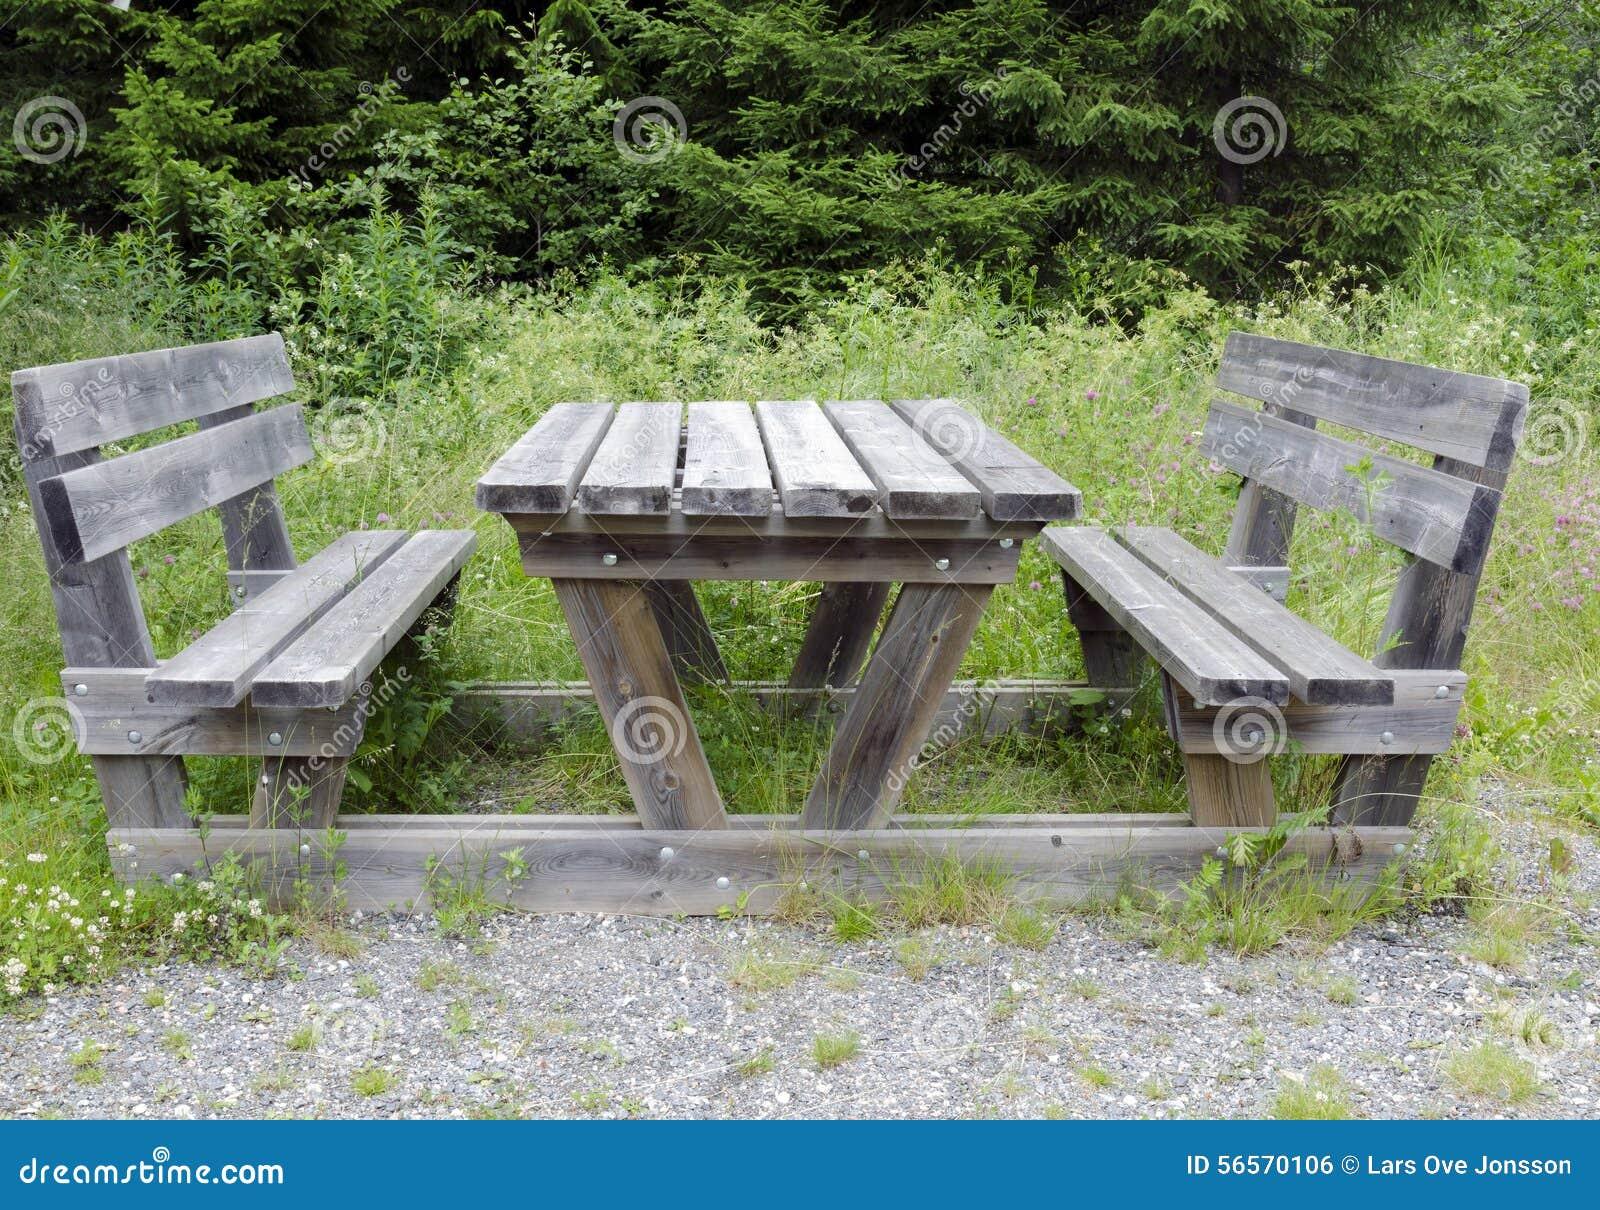 Download Θέση υπολοίπου στοκ εικόνες. εικόνα από κήπος, πάρκο - 56570106